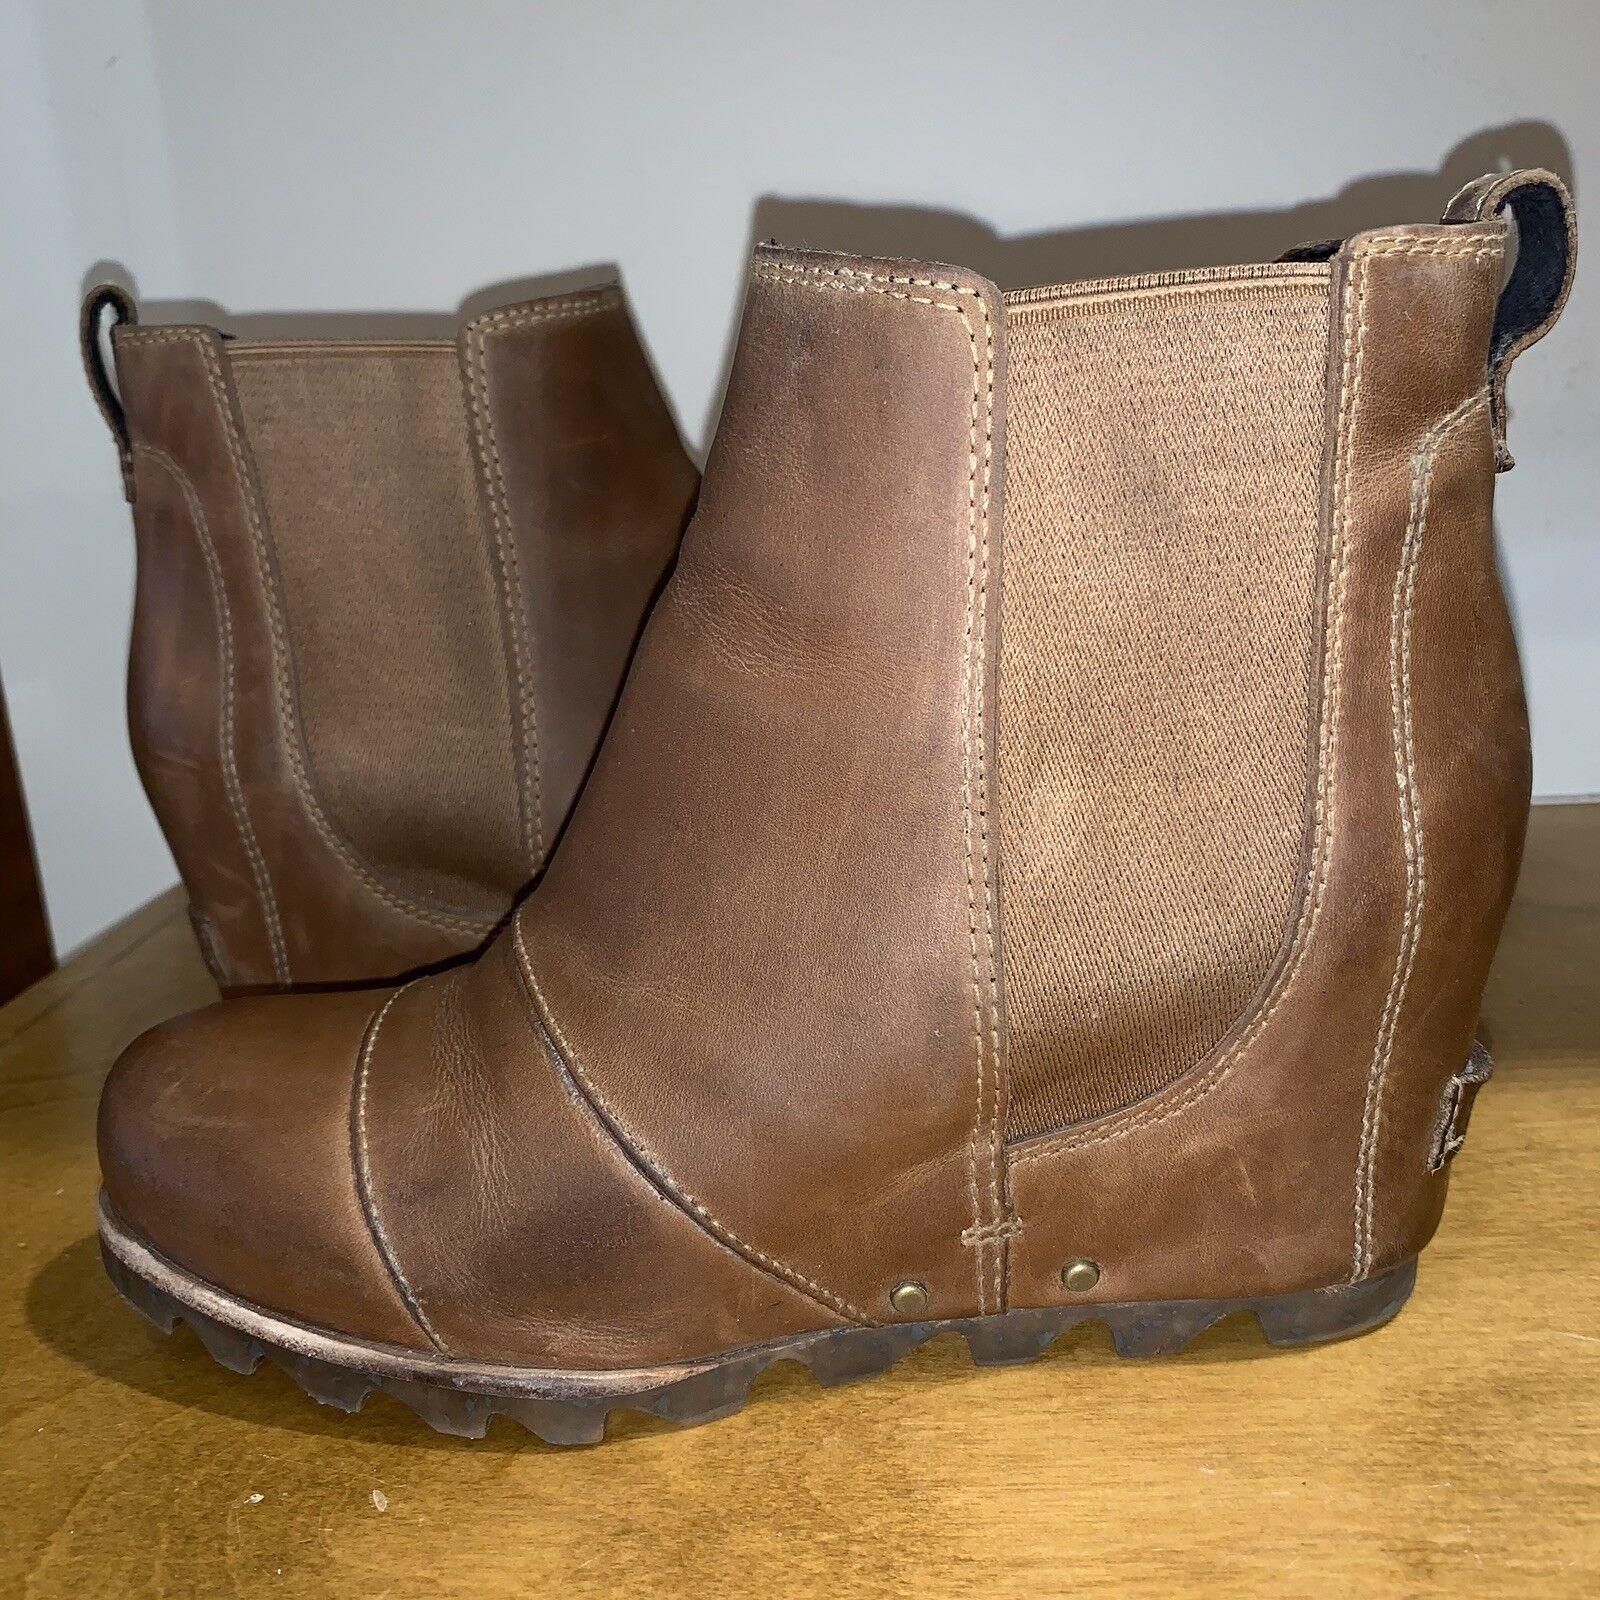 23752b40ee16 Sorel Lea Wedge Elk Curry 7 Joan Arctic Ankle Boot for sale online ...